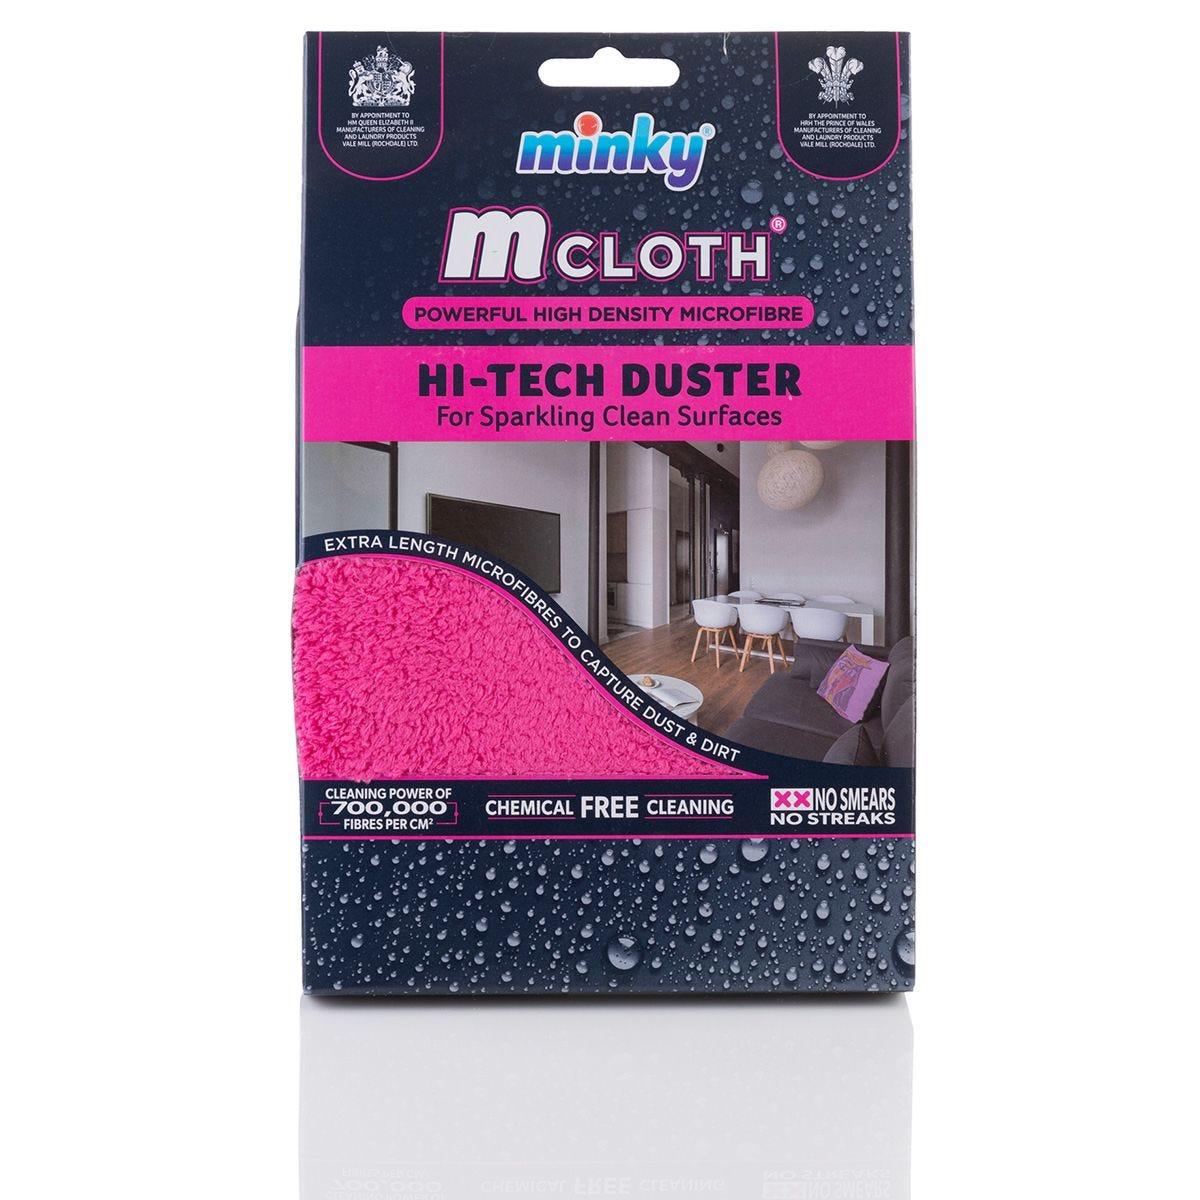 Minky Hi-Tech Duster Microfibre M-Cloth